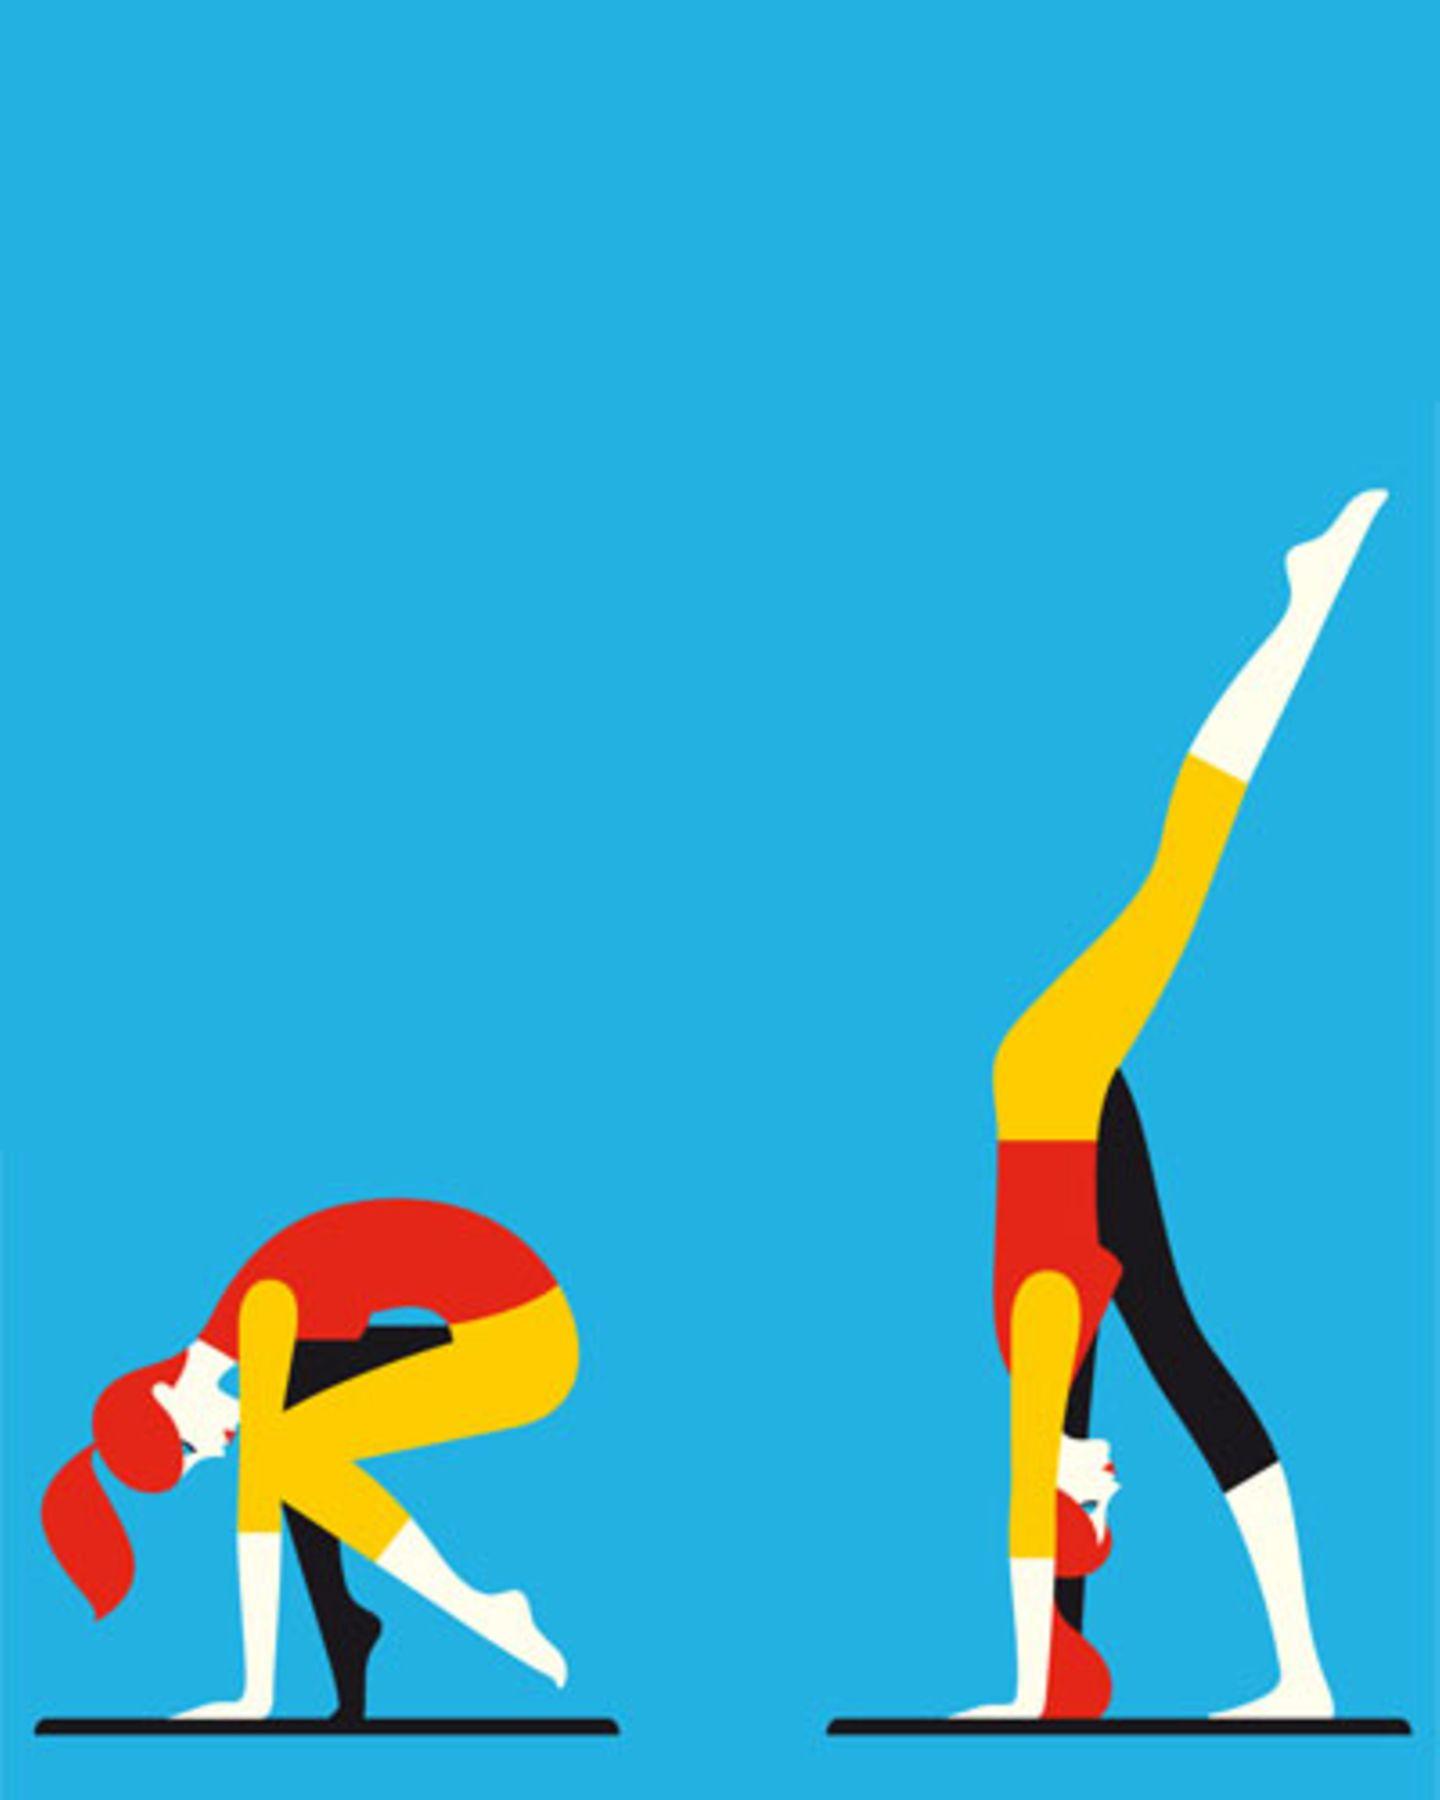 Übung 1: Standing split